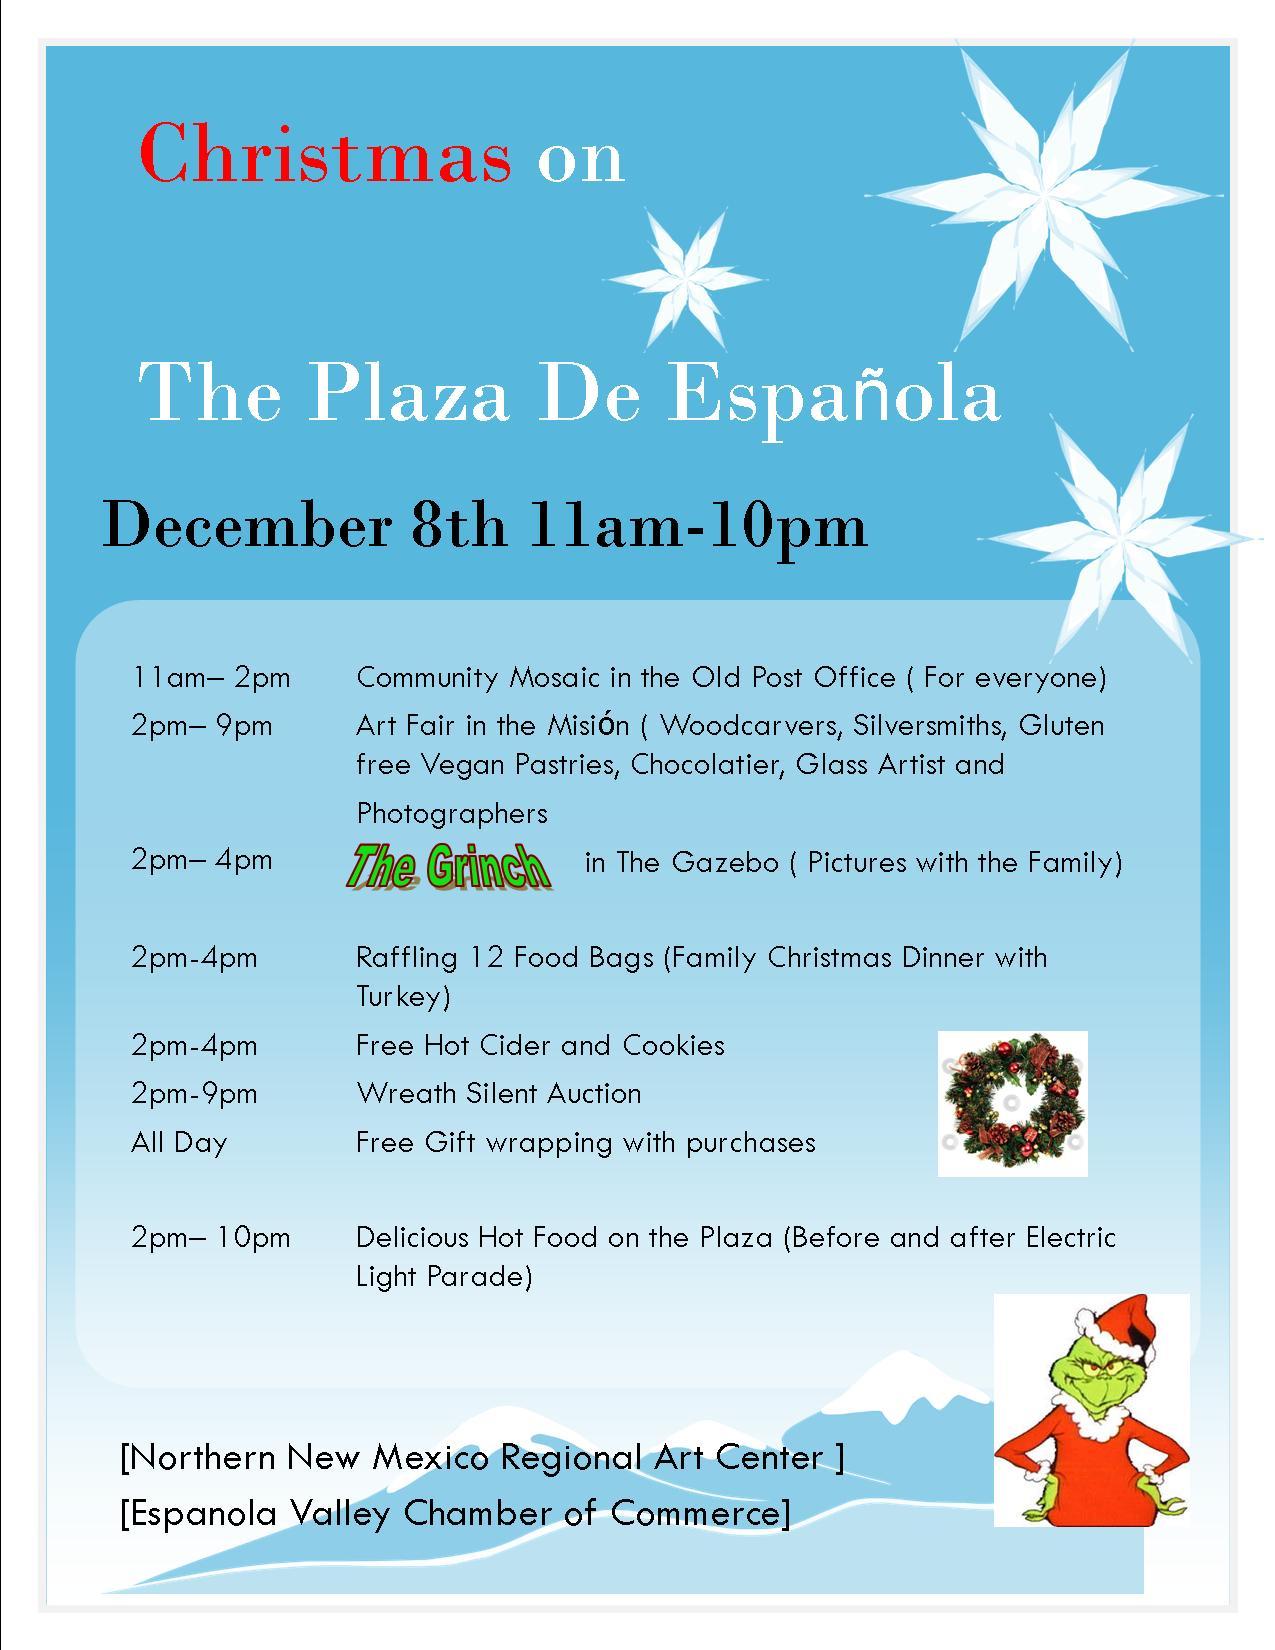 Christmas-plaza-Timeline-(1).jpg